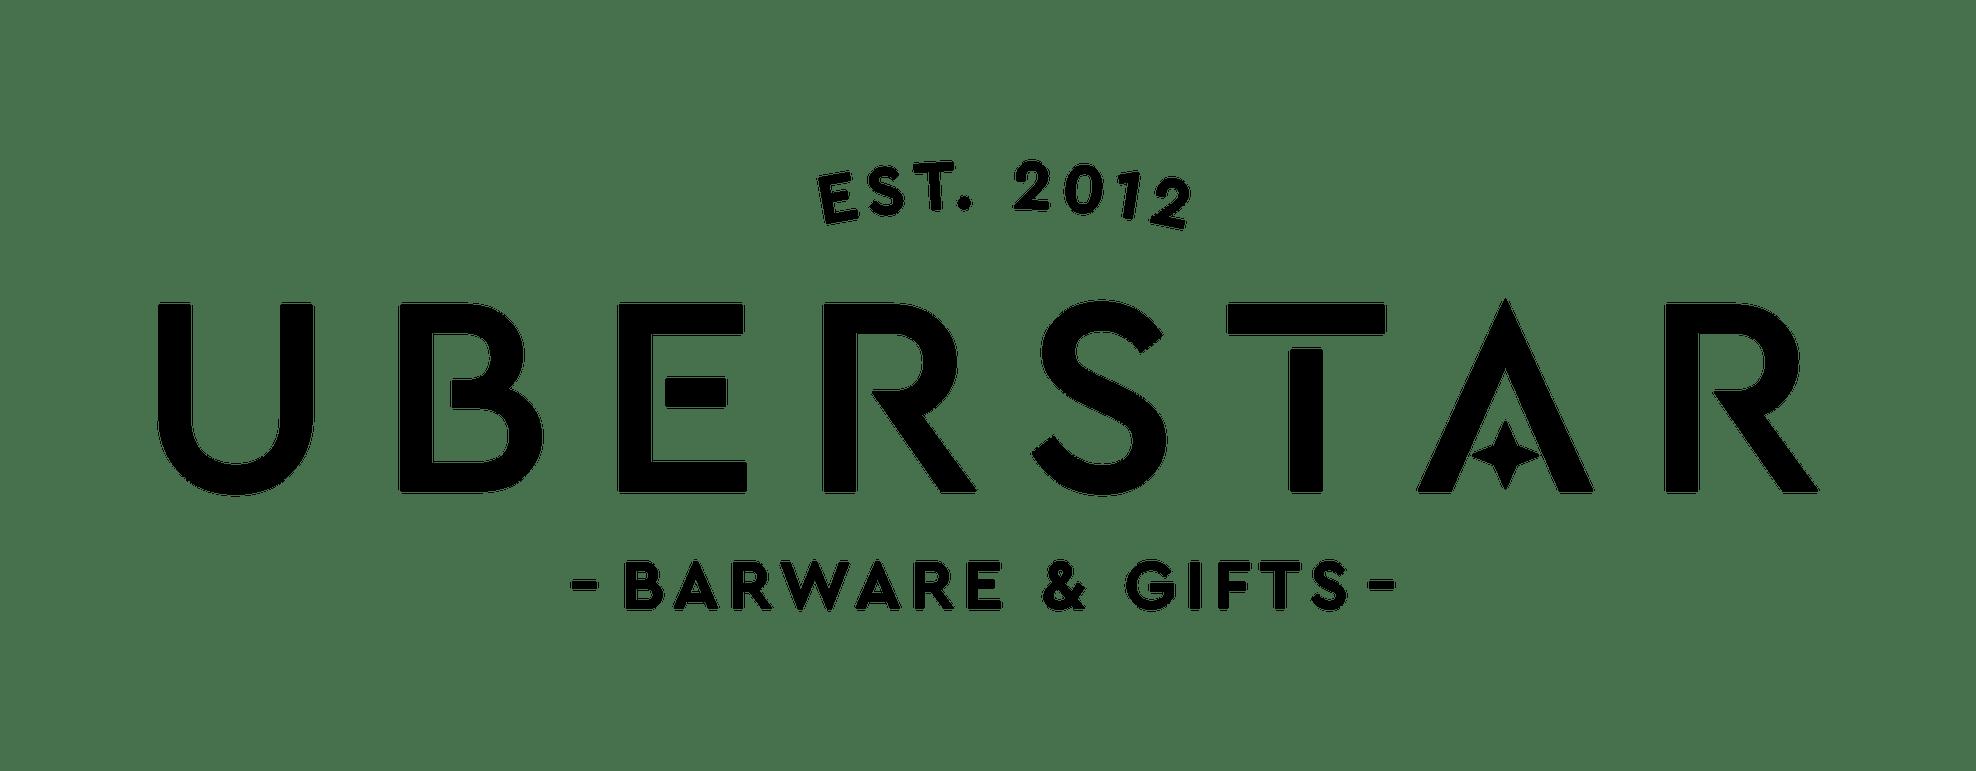 UBERSTAR